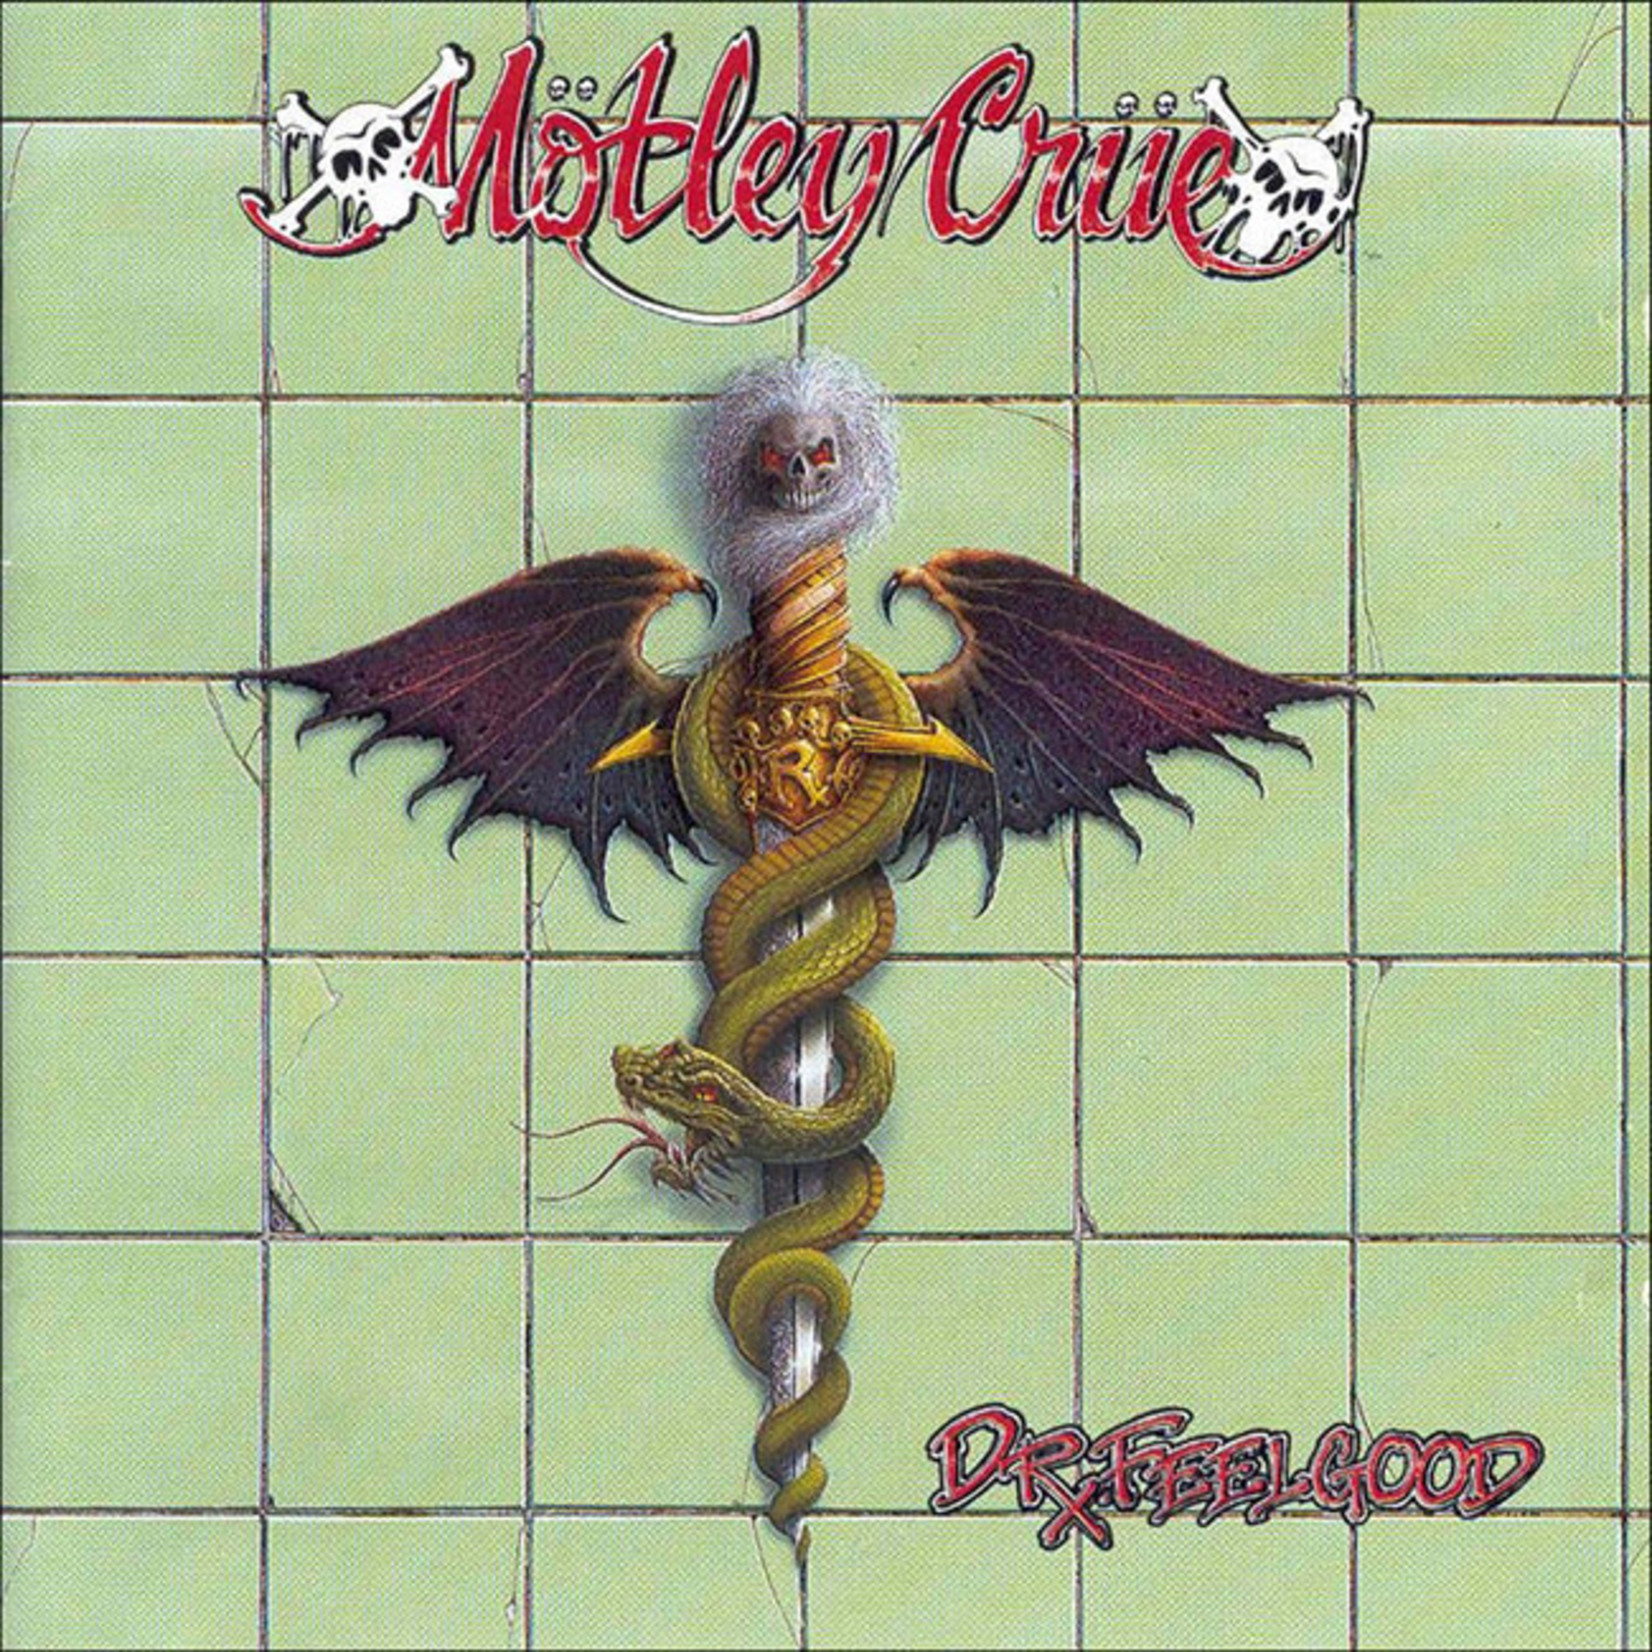 [New] Motley Crue: Dr. Feelgood (30th Anniversary Ed.)